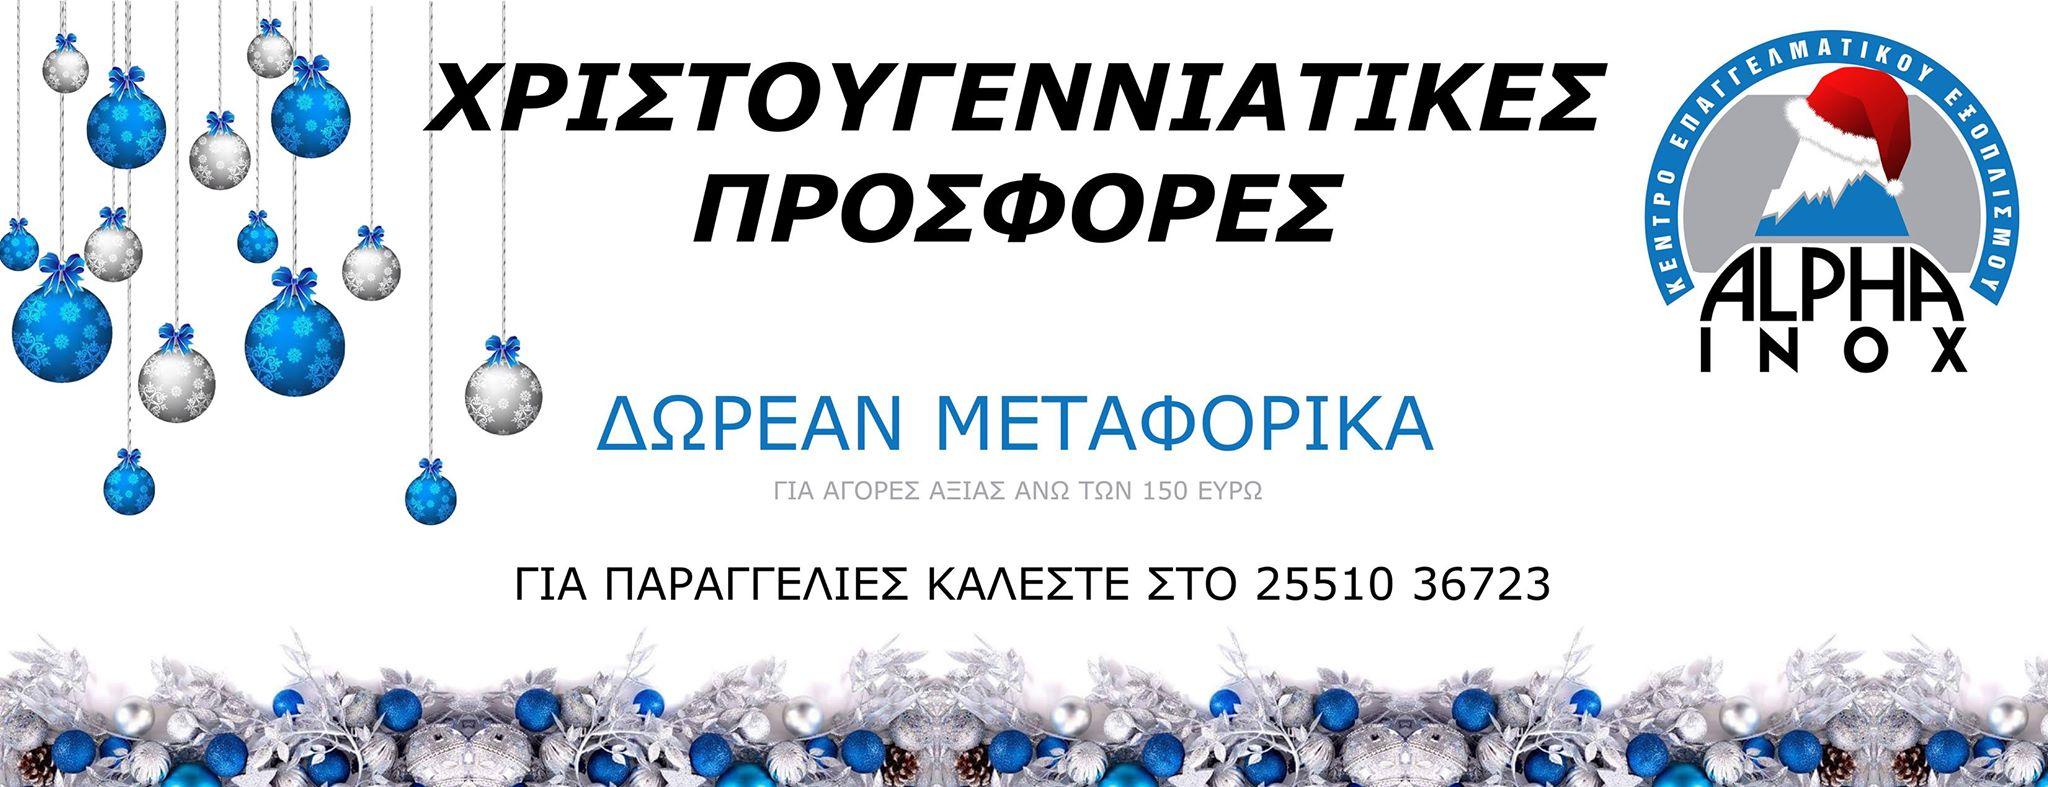 alphainox_xmas